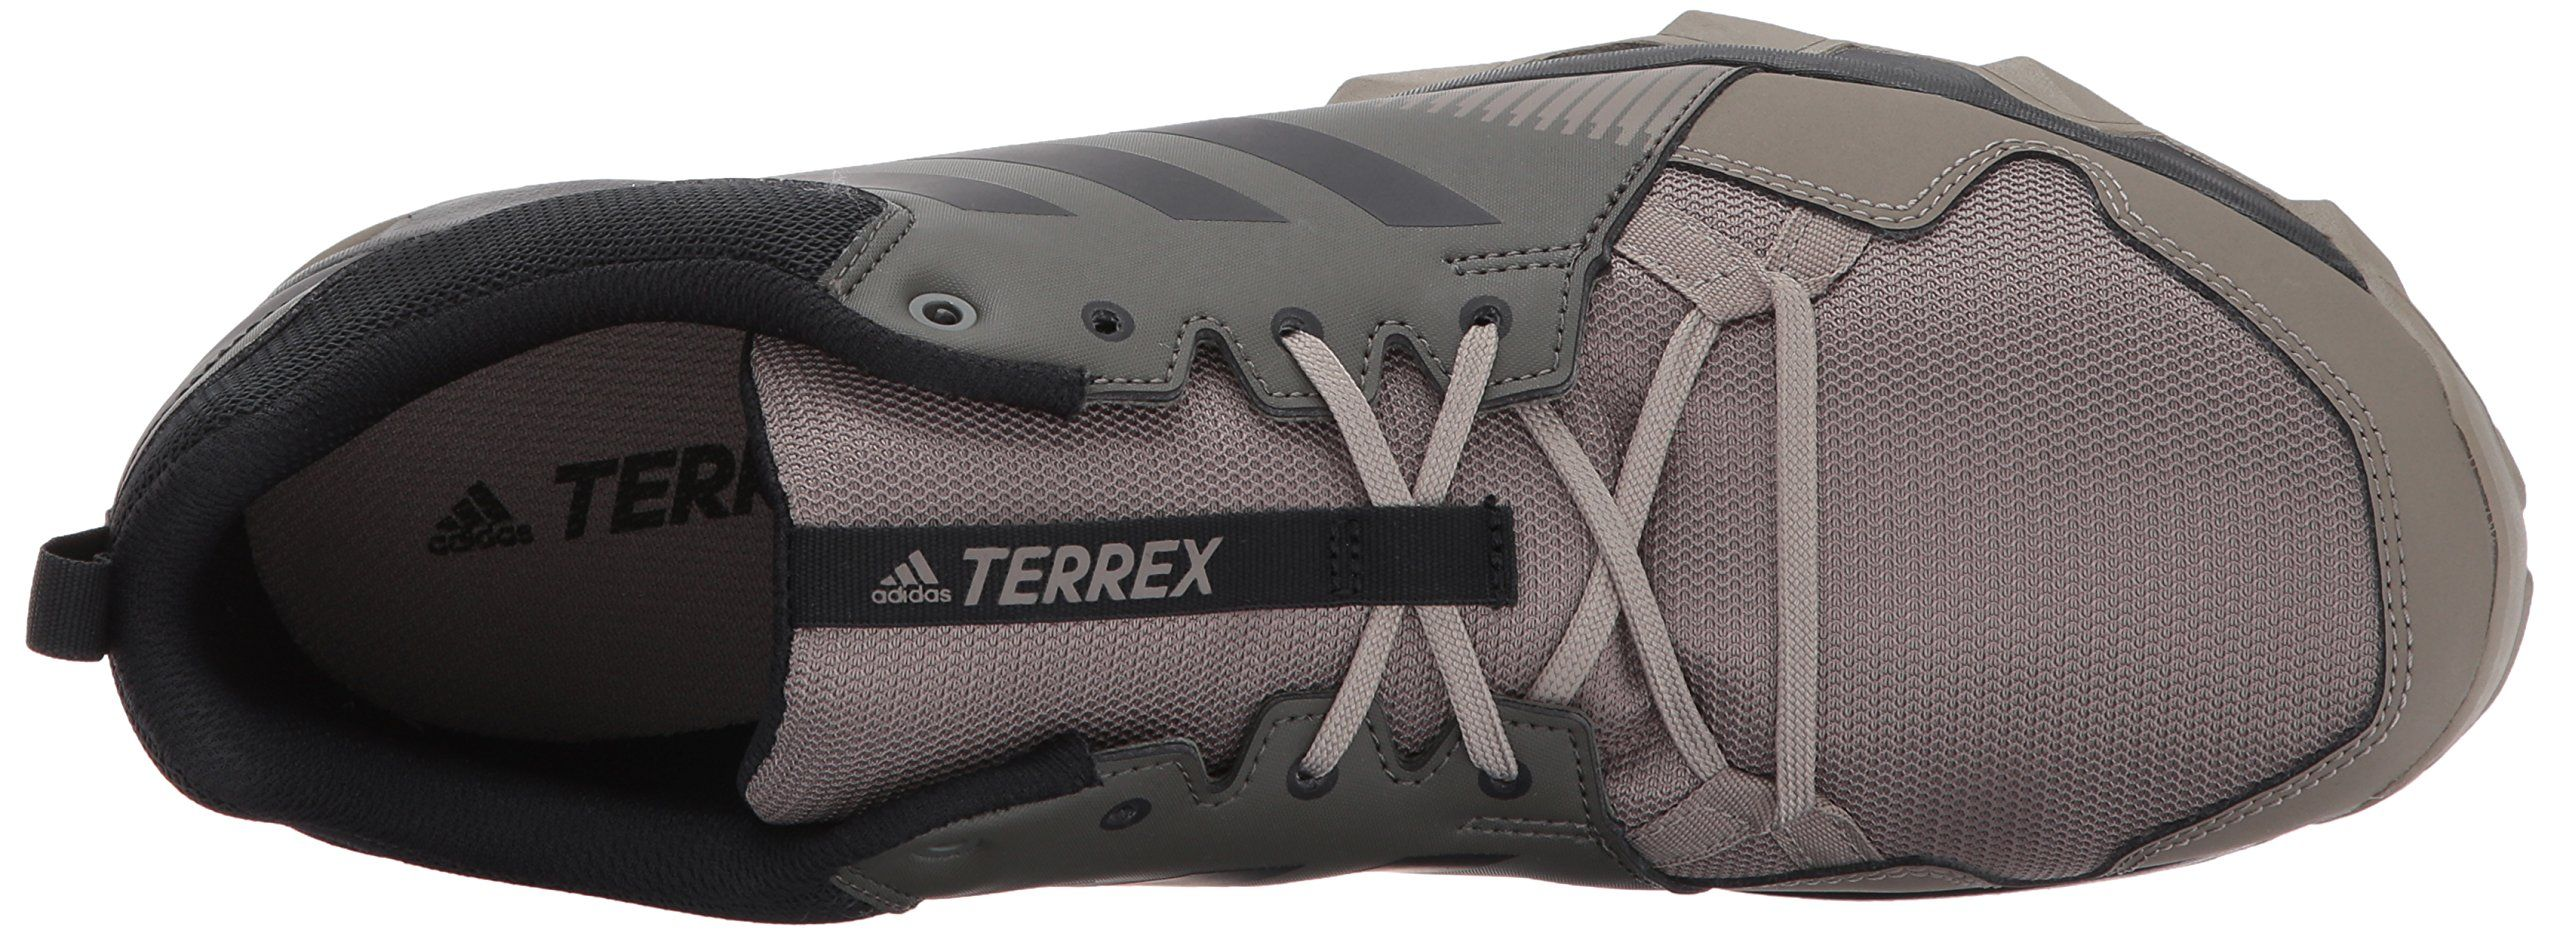 adidas outdoor Mens Terrex Tracerocker